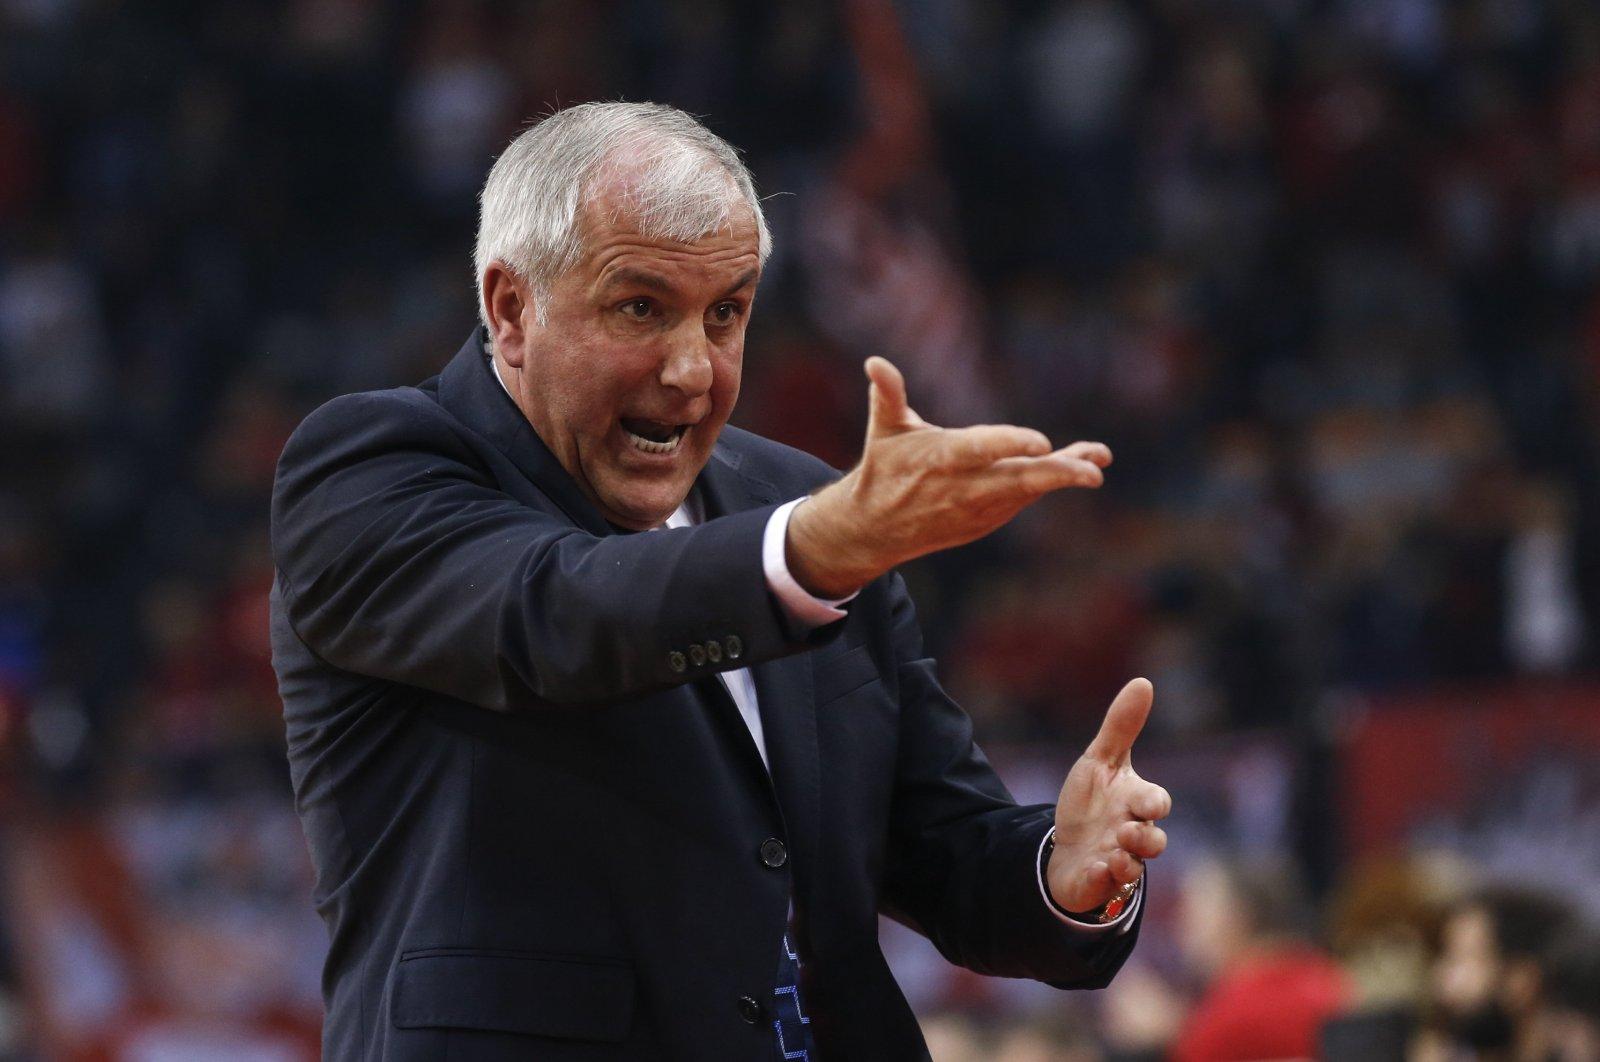 Zeljko Obradovic gestures during a EuroLeague match in Athens, Greece, Nov. 17, 2018. (AA Photo)